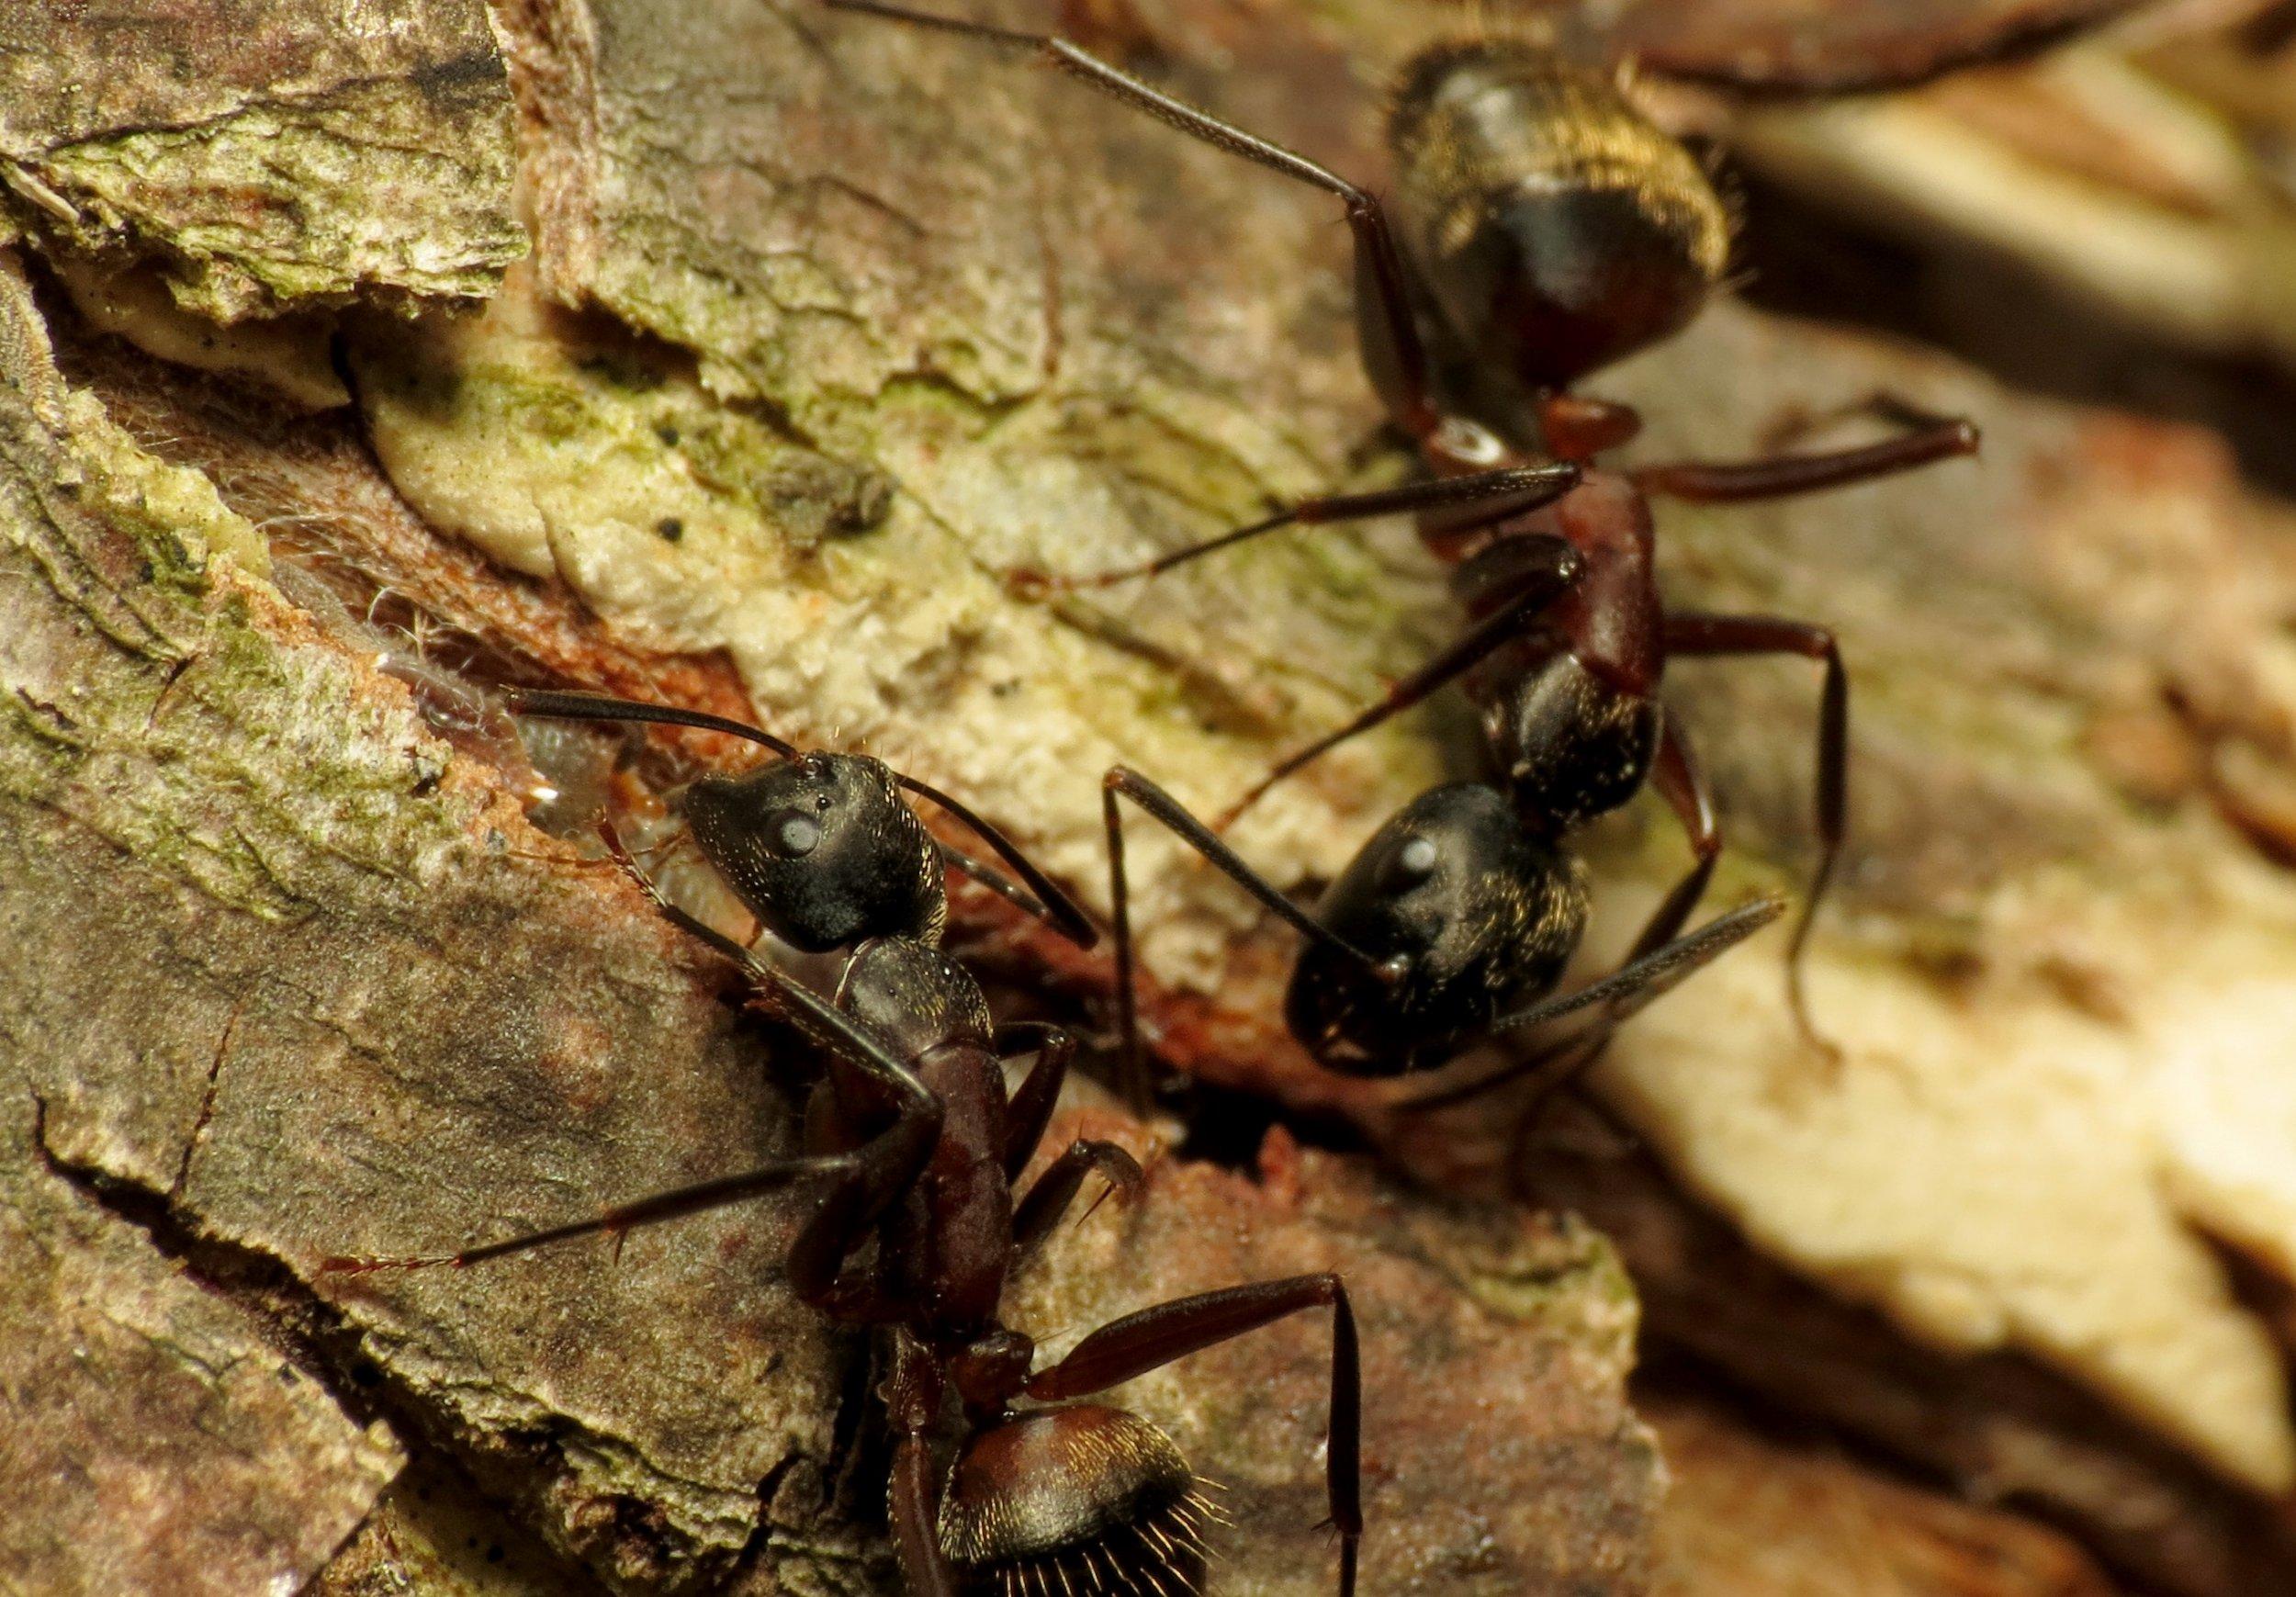 Carpenter_Ants_-_Flickr_-_treegrow